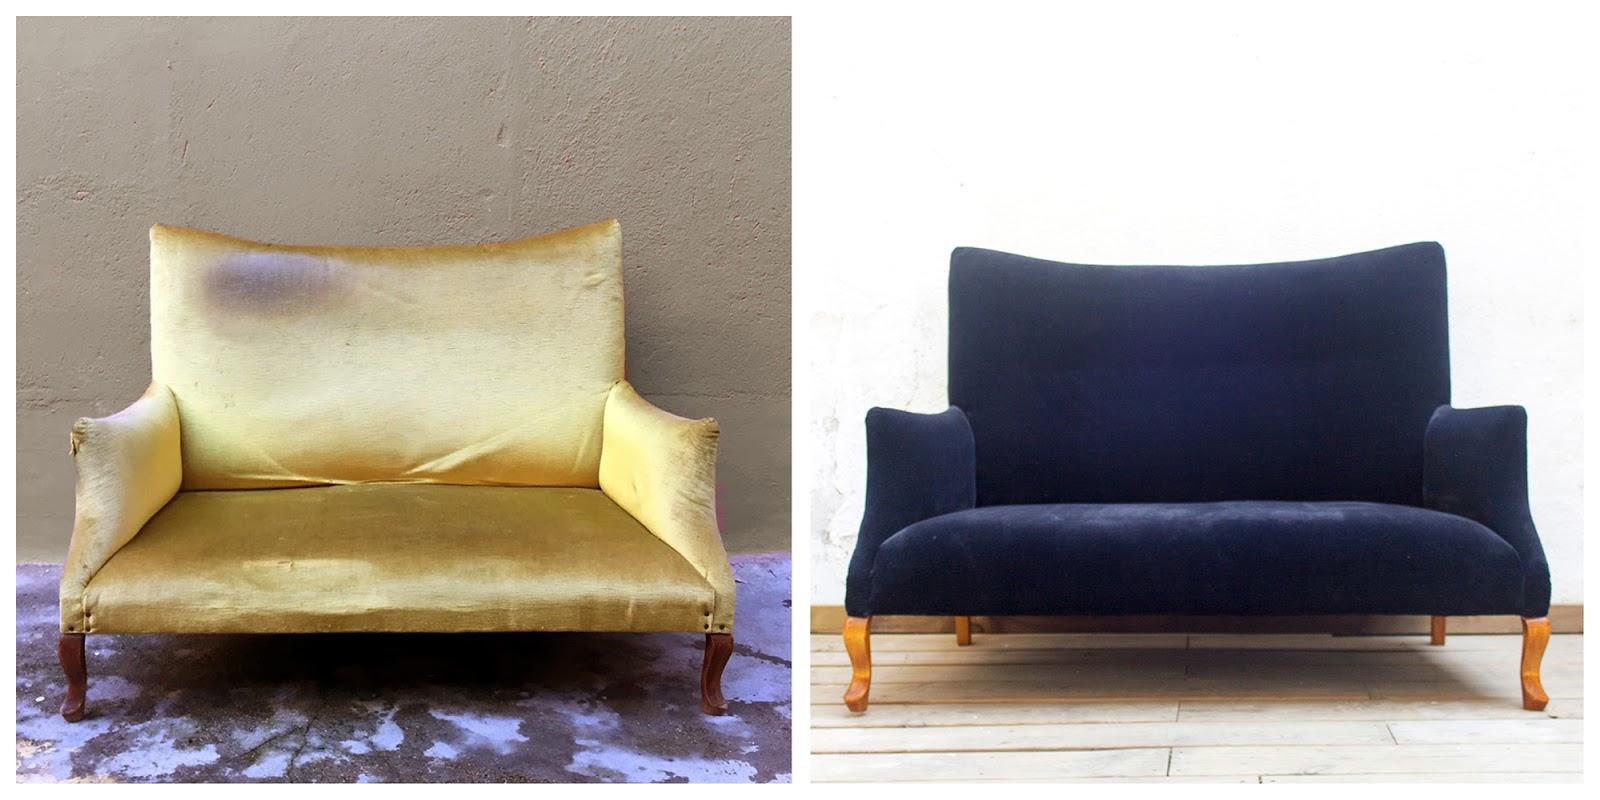 Sofá canapé de 2 plazas restaurado y tapizado en terciopelo negro.